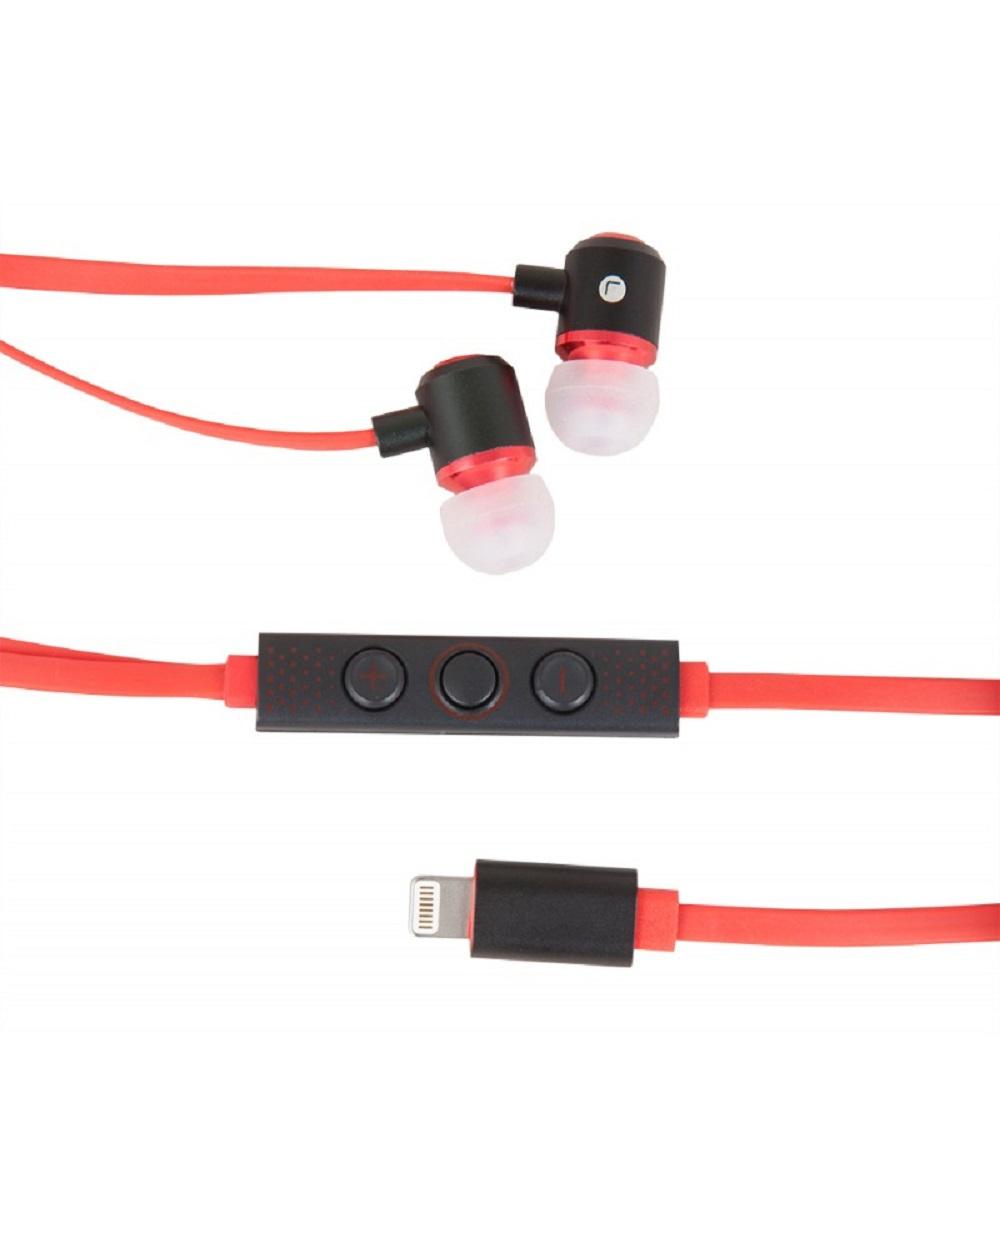 LIGHTNING EARPHONES - RED                                  IN